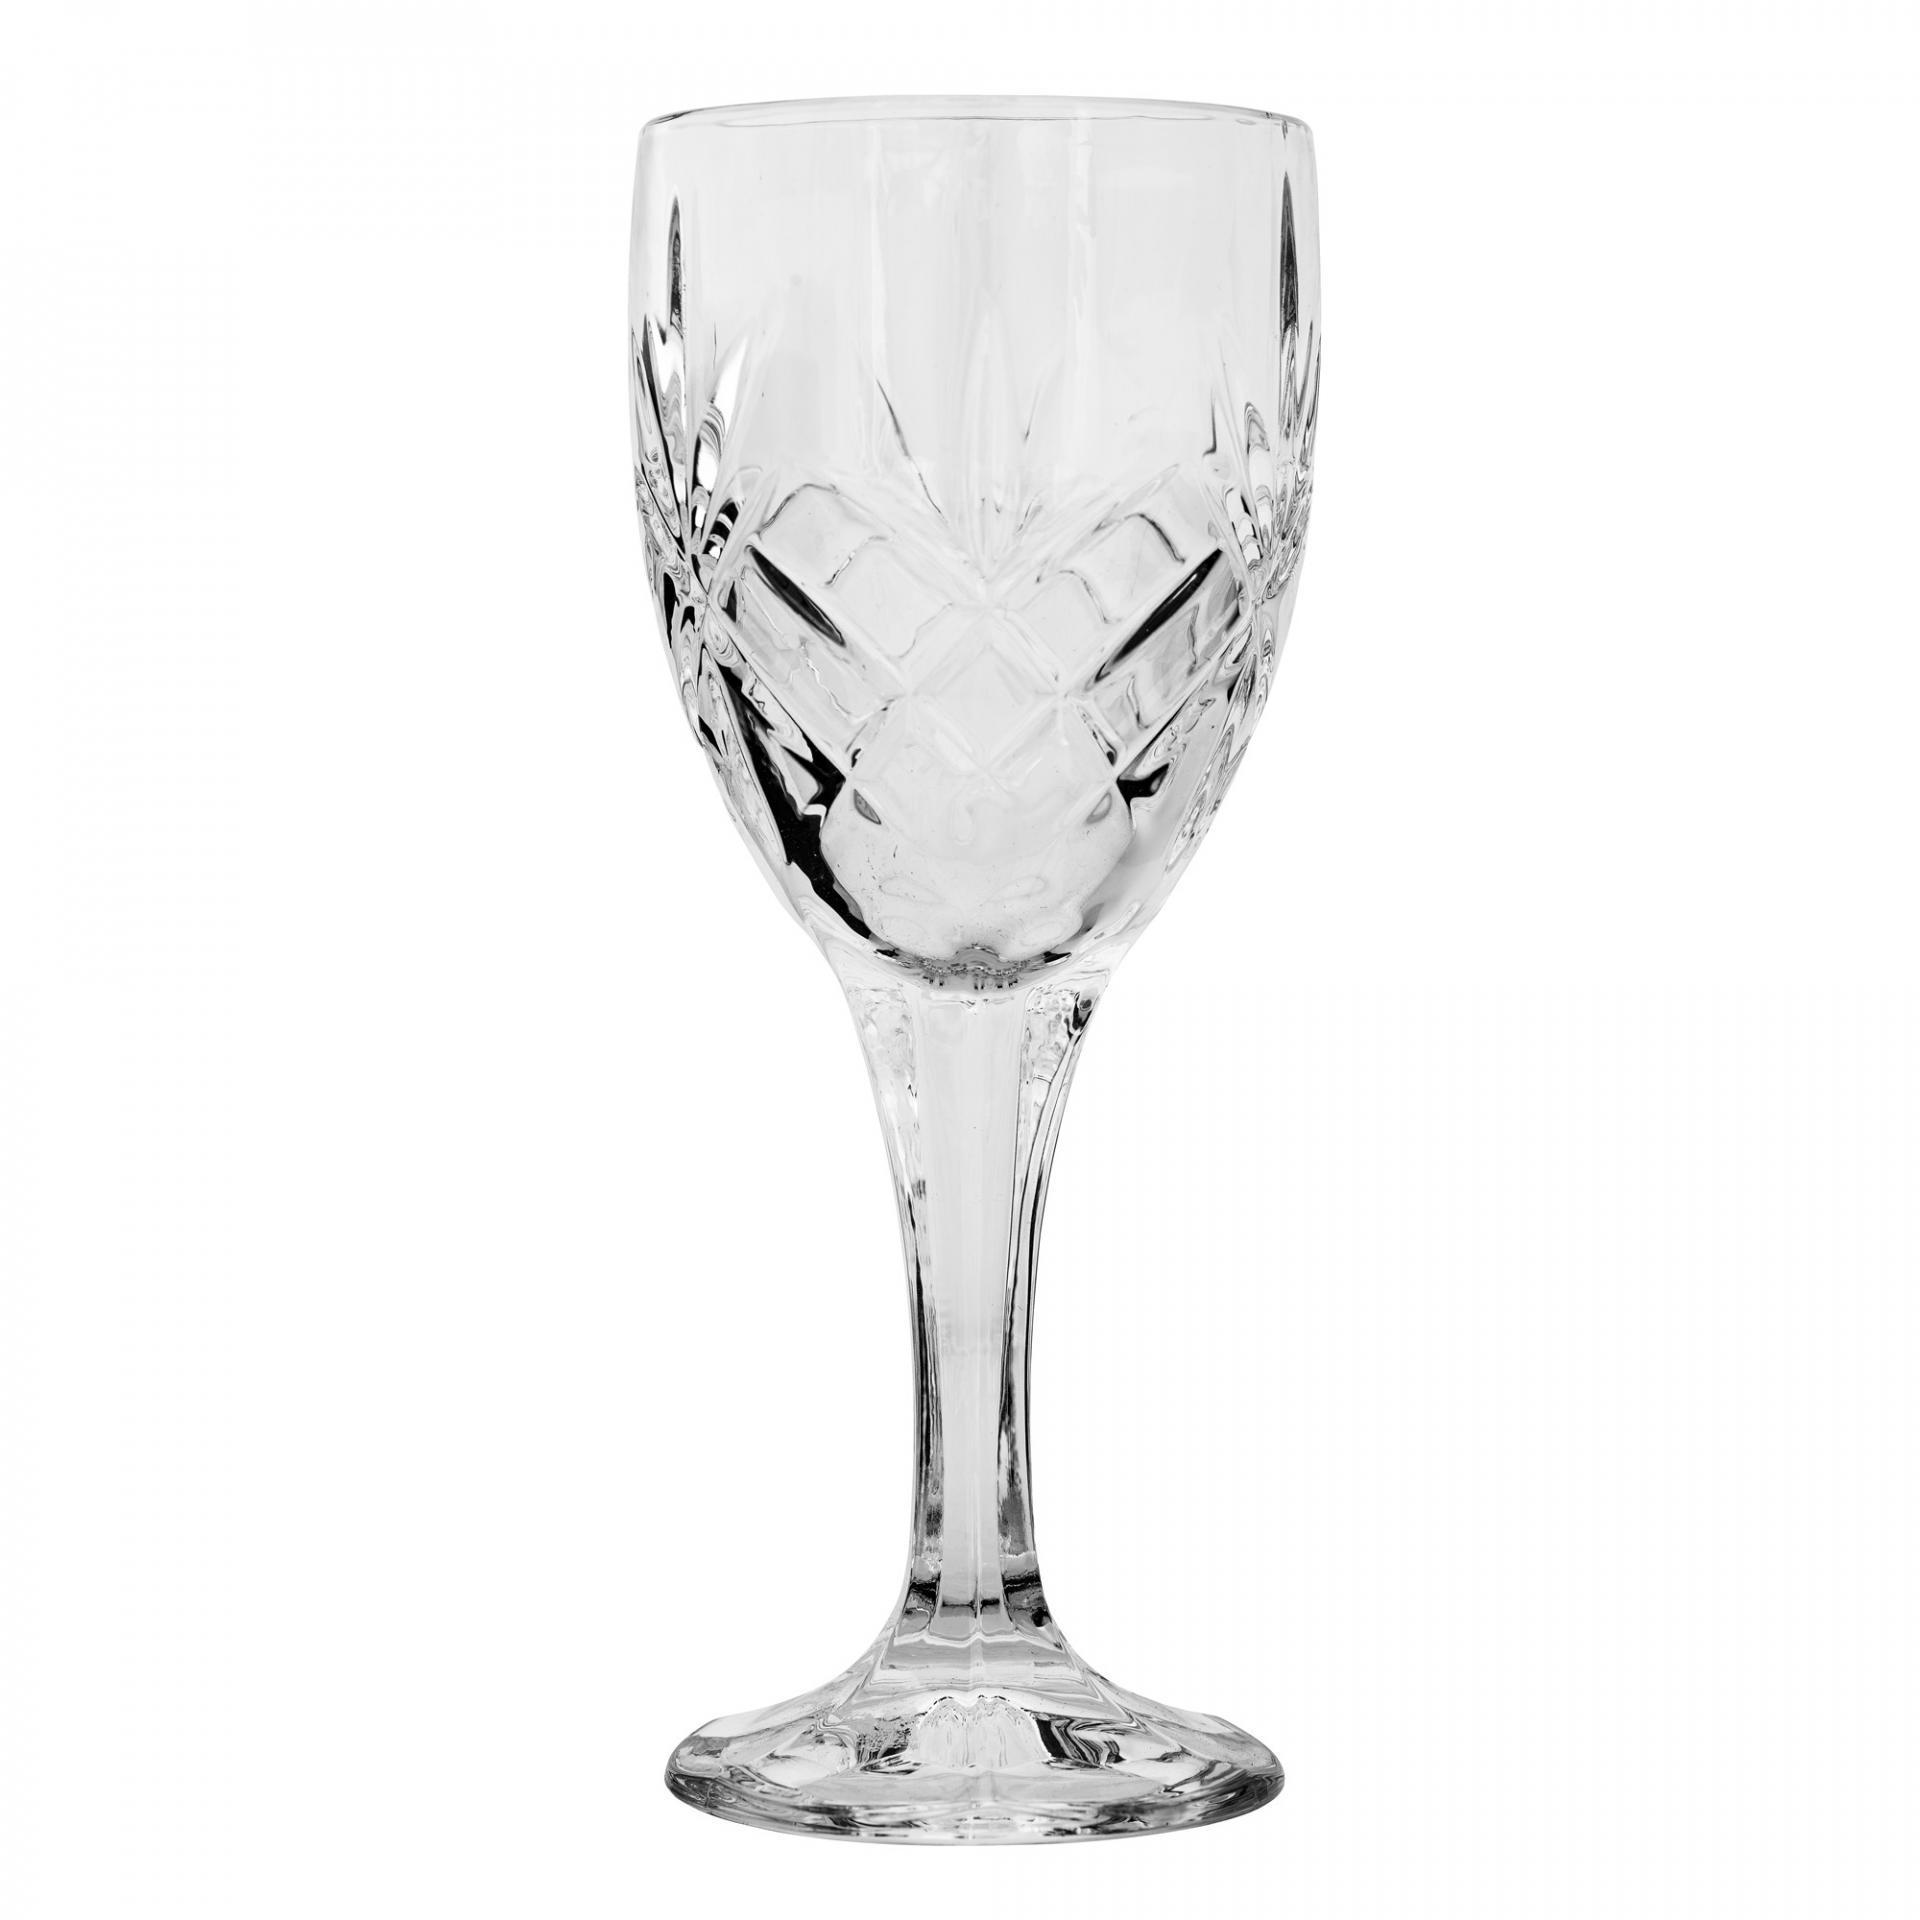 Bloomingville Sklenička na víno Crystal, čirá barva, sklo